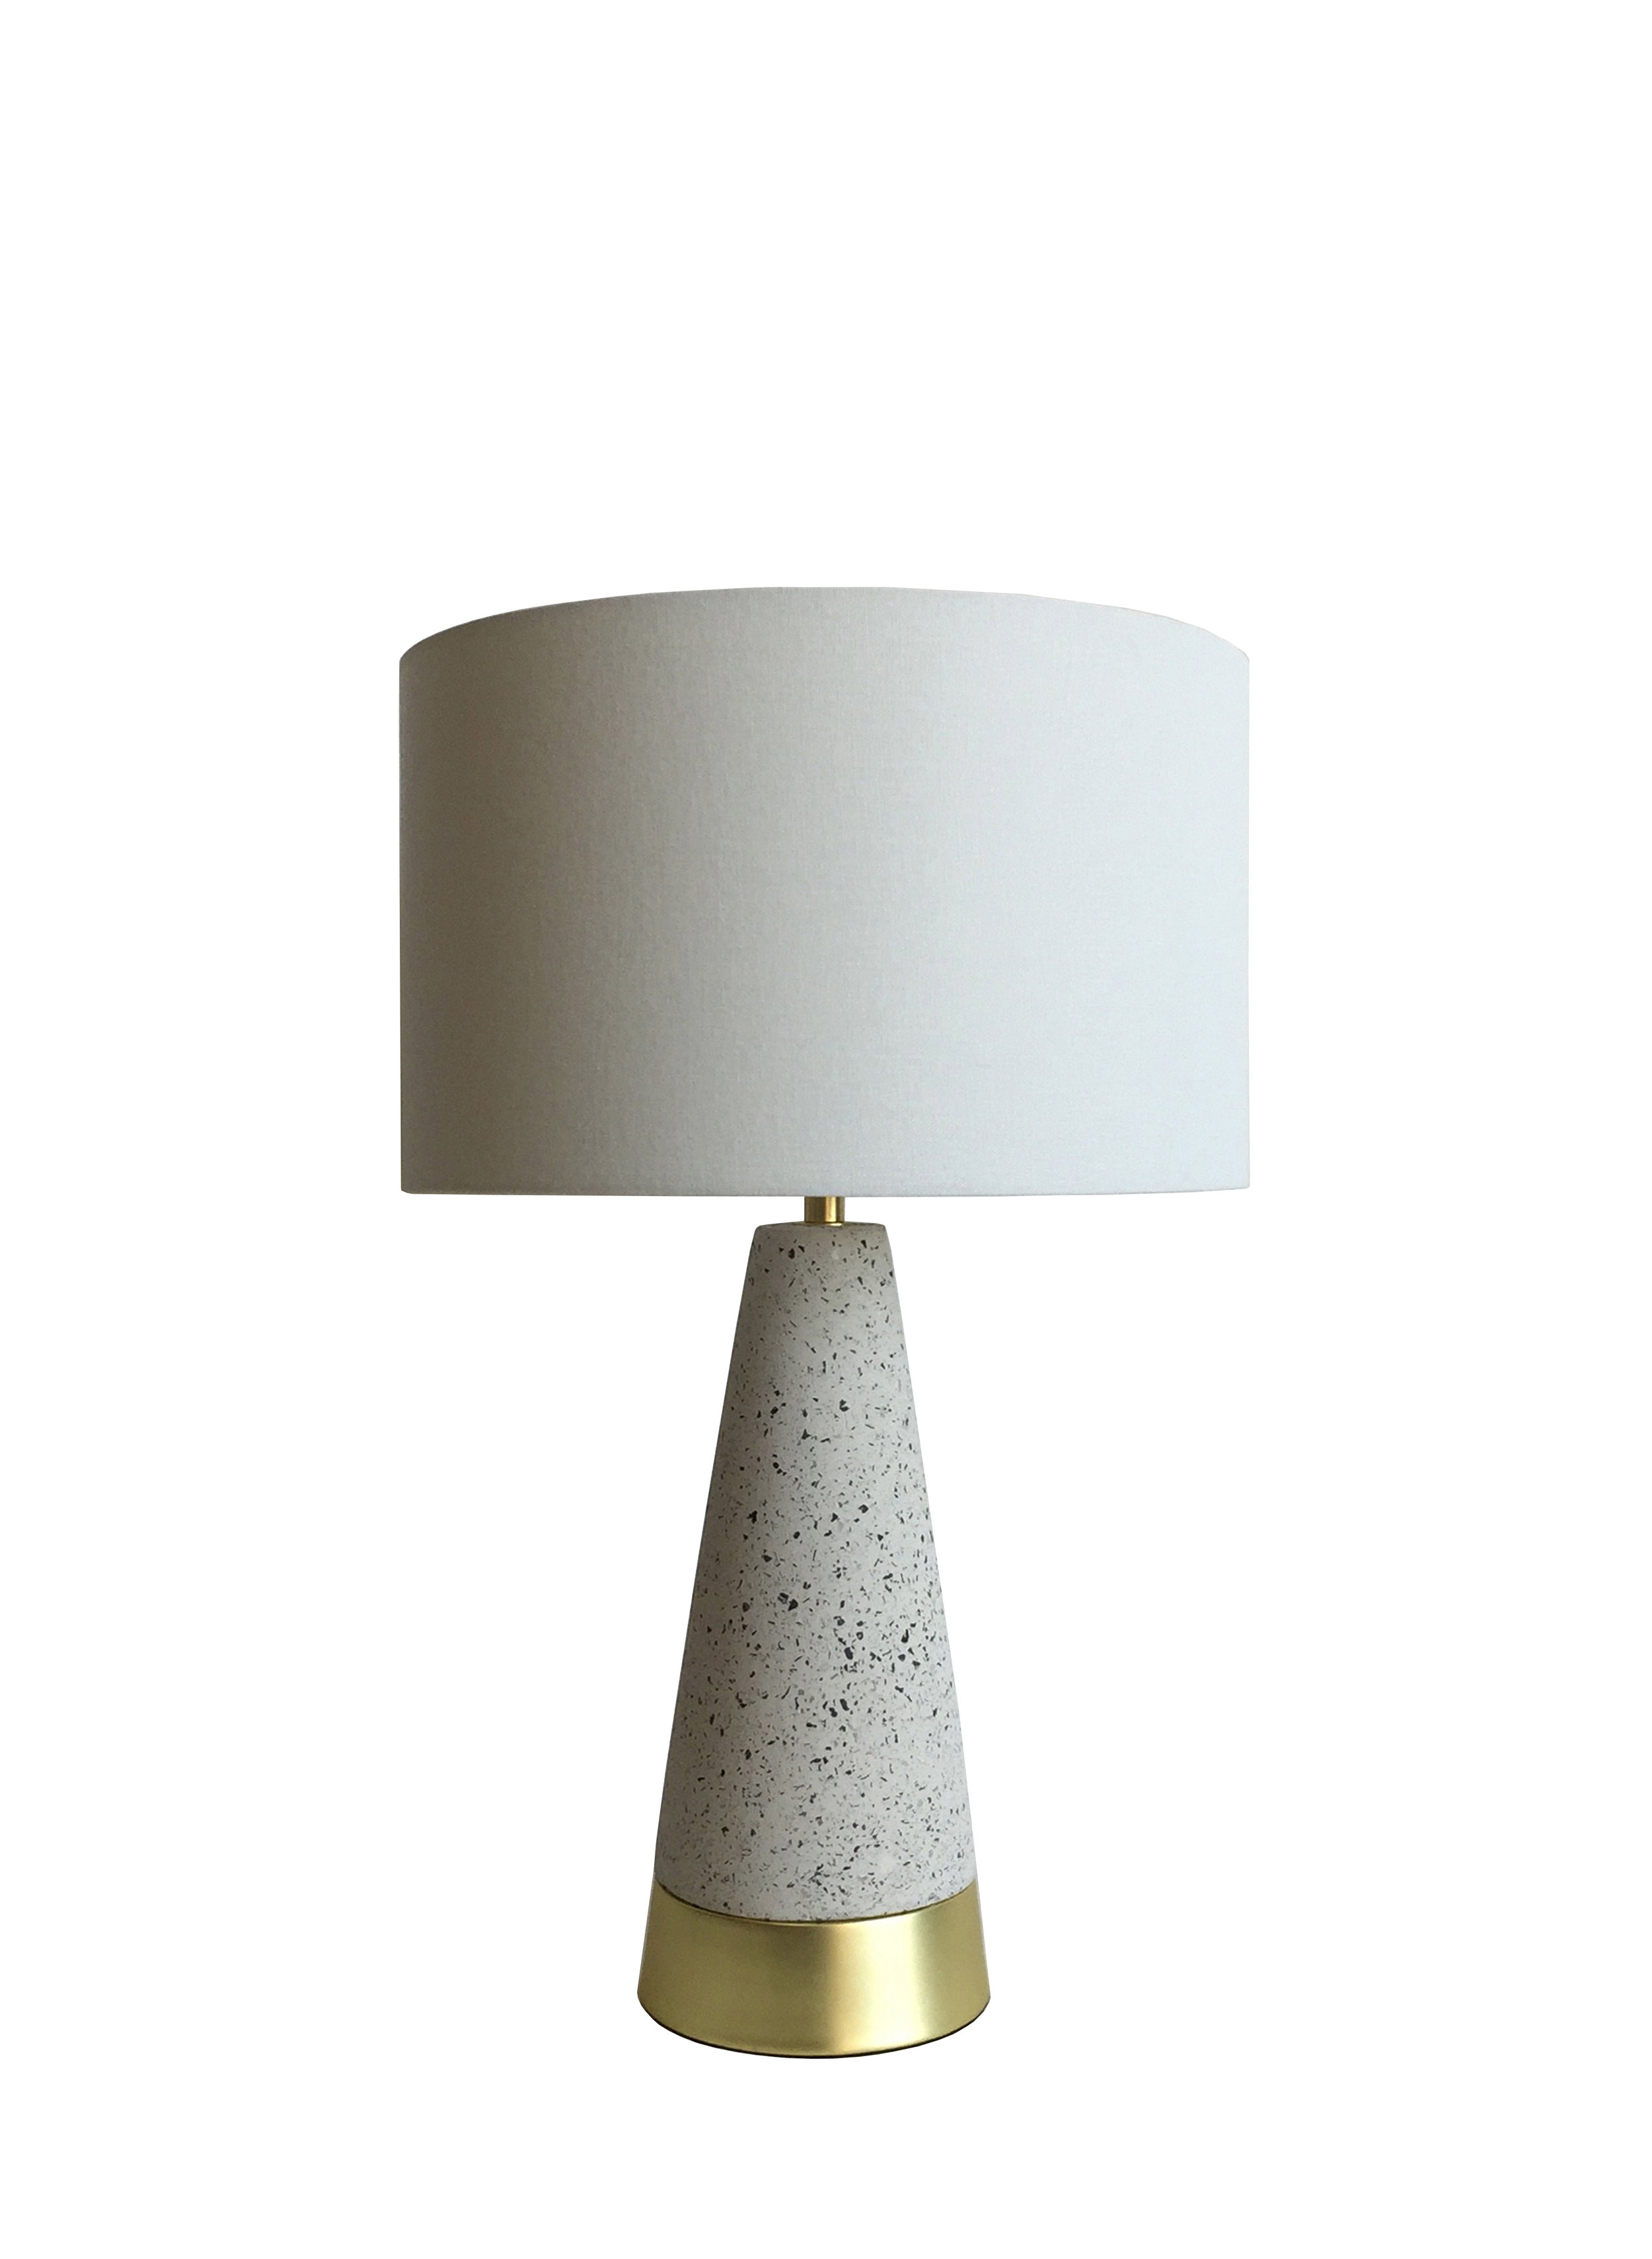 30003660_02_Freda-Terazza-Table-Lamp.jpg